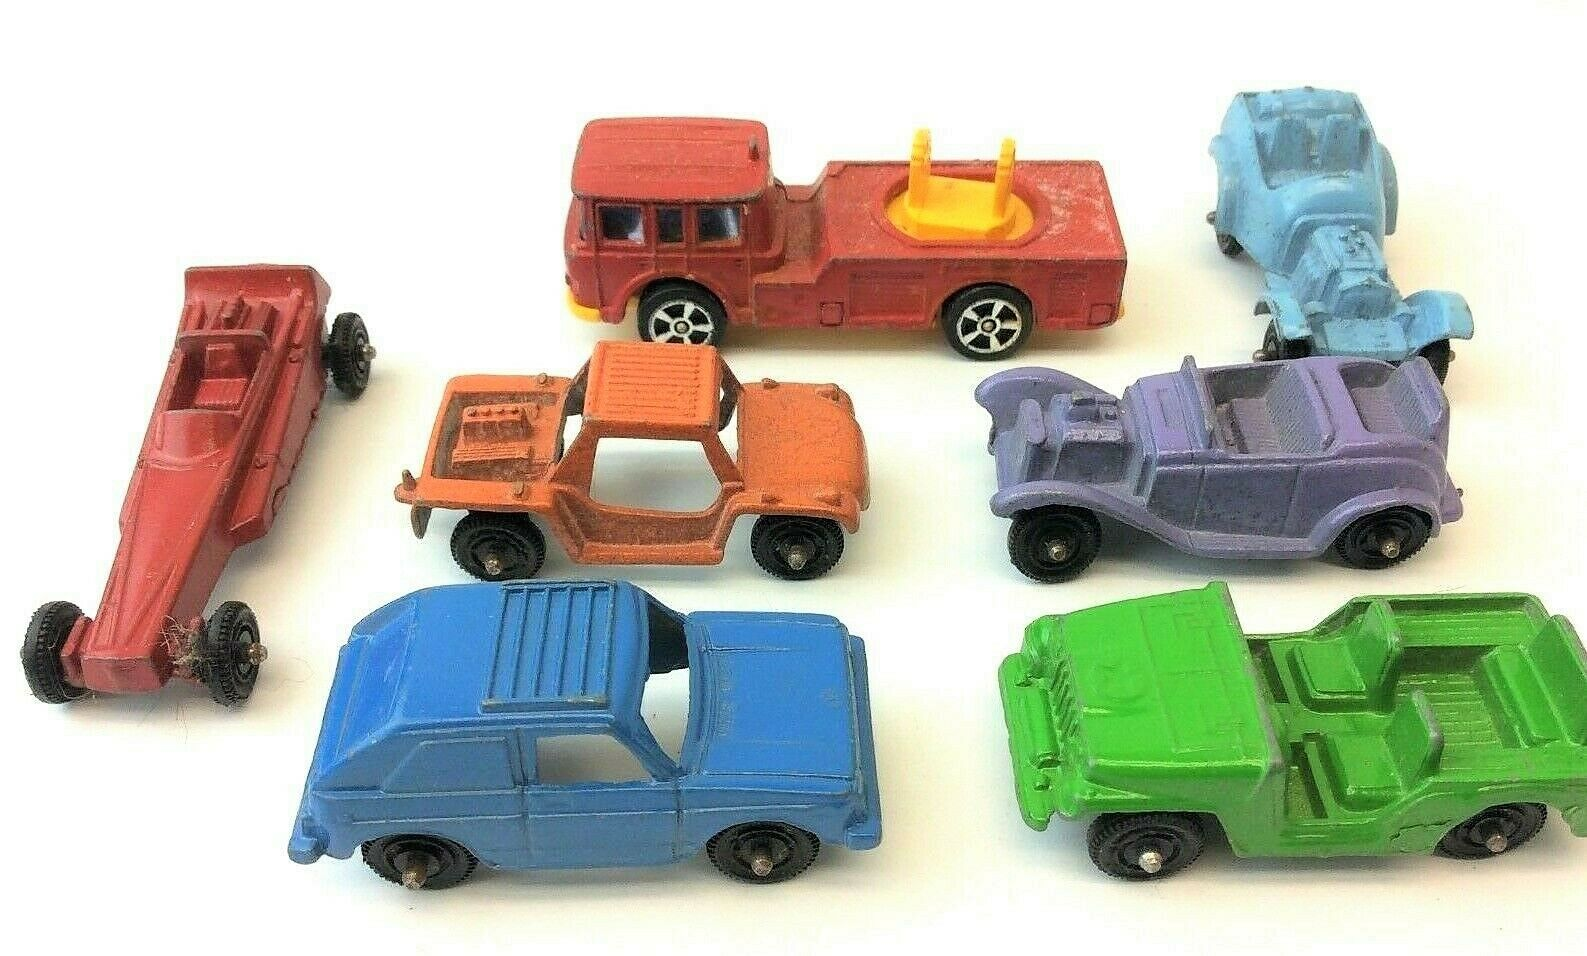 Gemischtes Lot Druckguss Tootsie Spielzeug USA Hase Jeep Roadster Hot Wheels